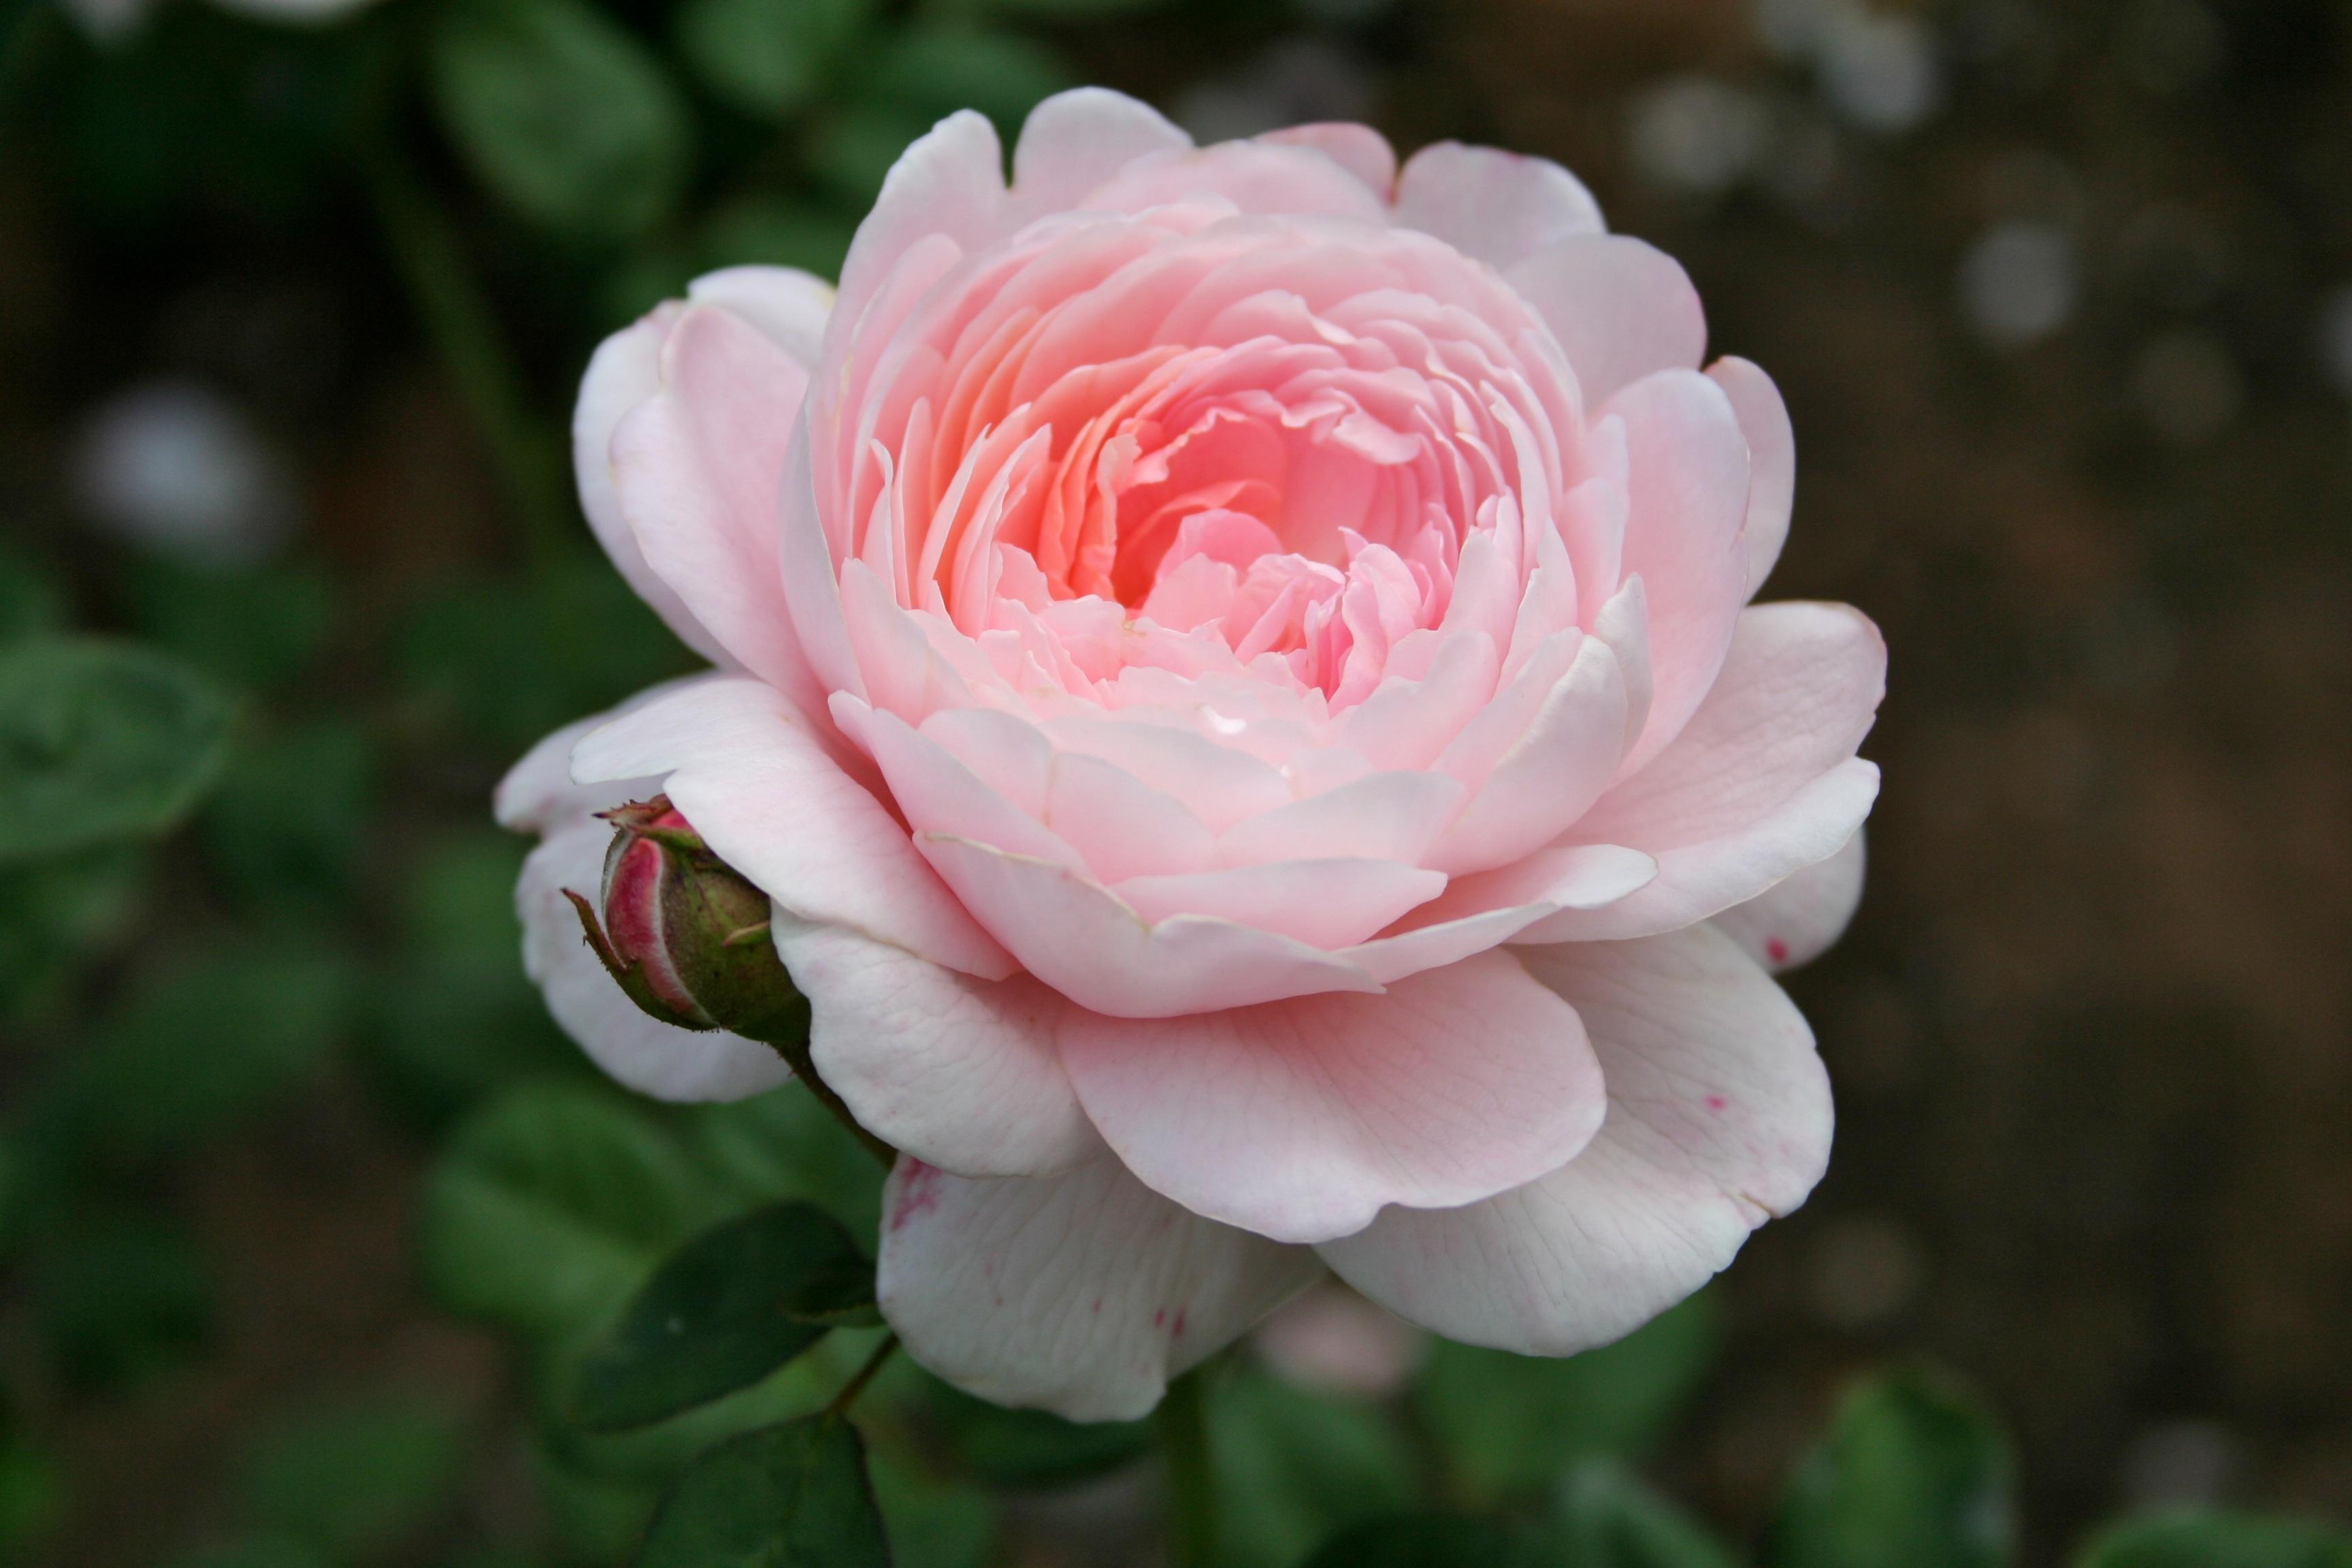 File:Pink rose 1.jpg - Wikimedia Commons